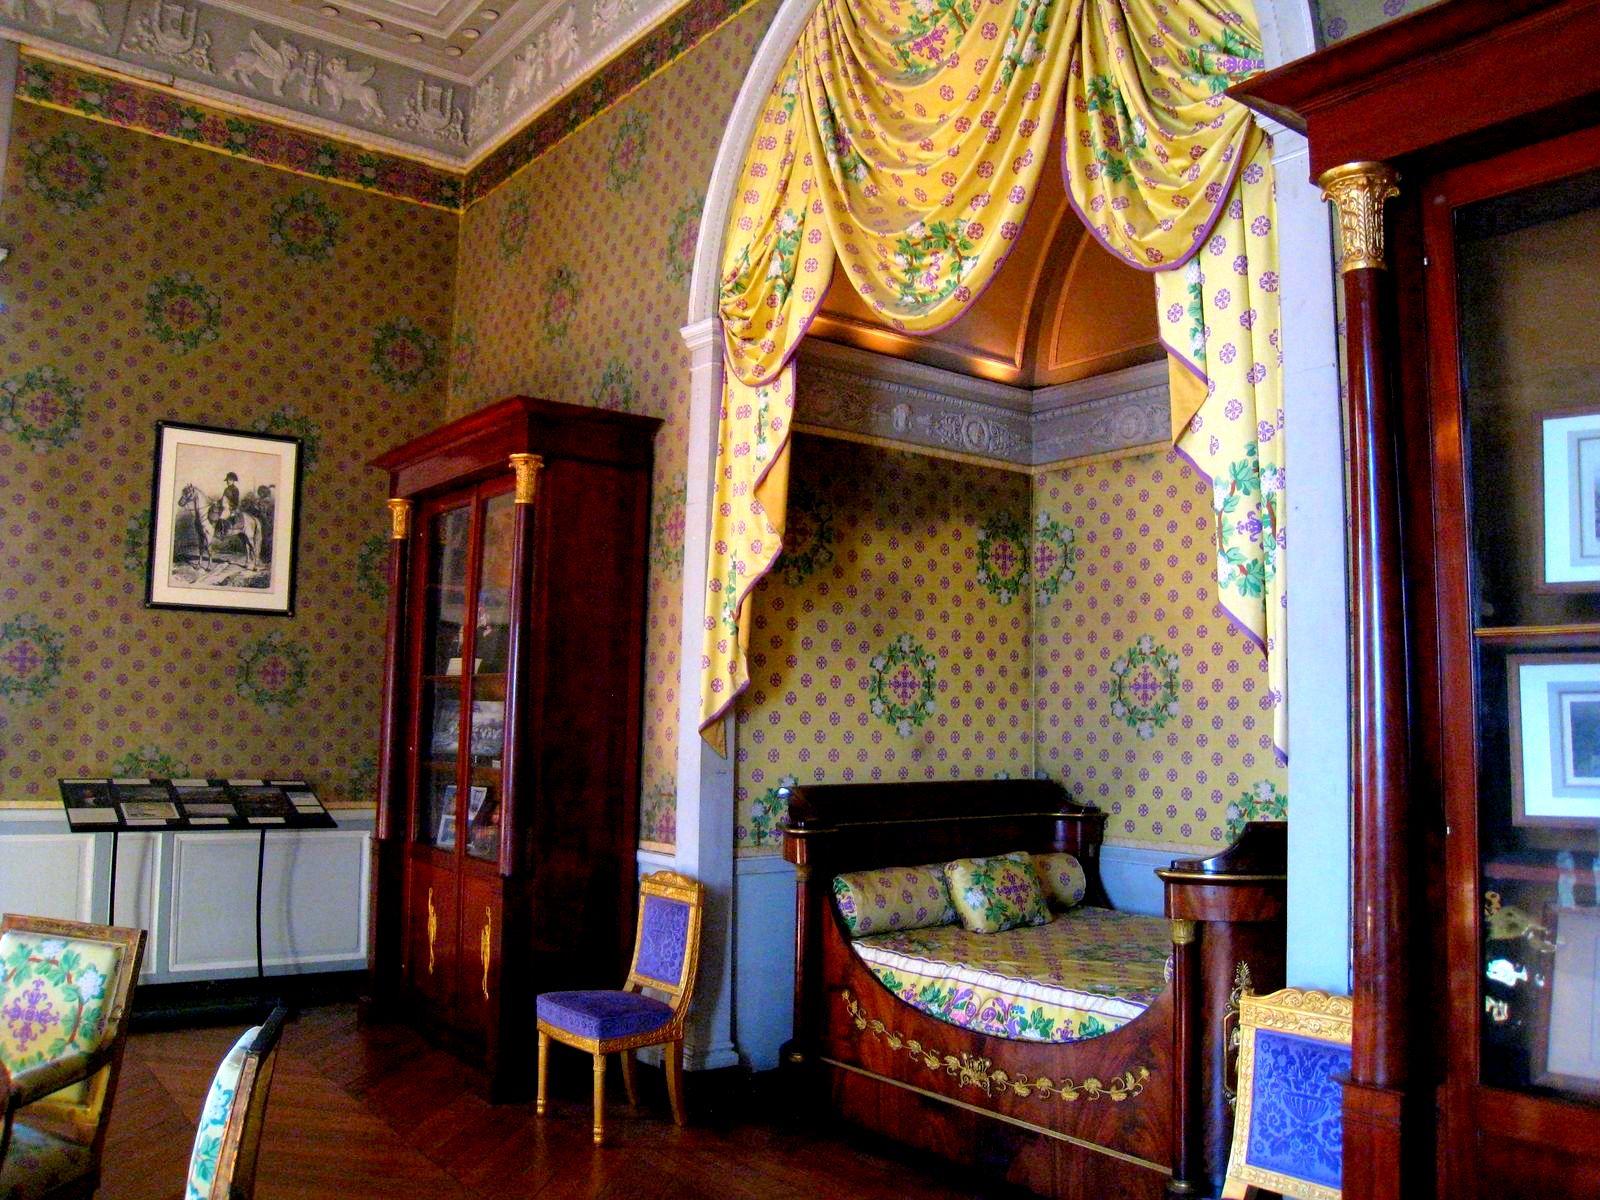 1000 images about alcove beds on pinterest nooks. Black Bedroom Furniture Sets. Home Design Ideas